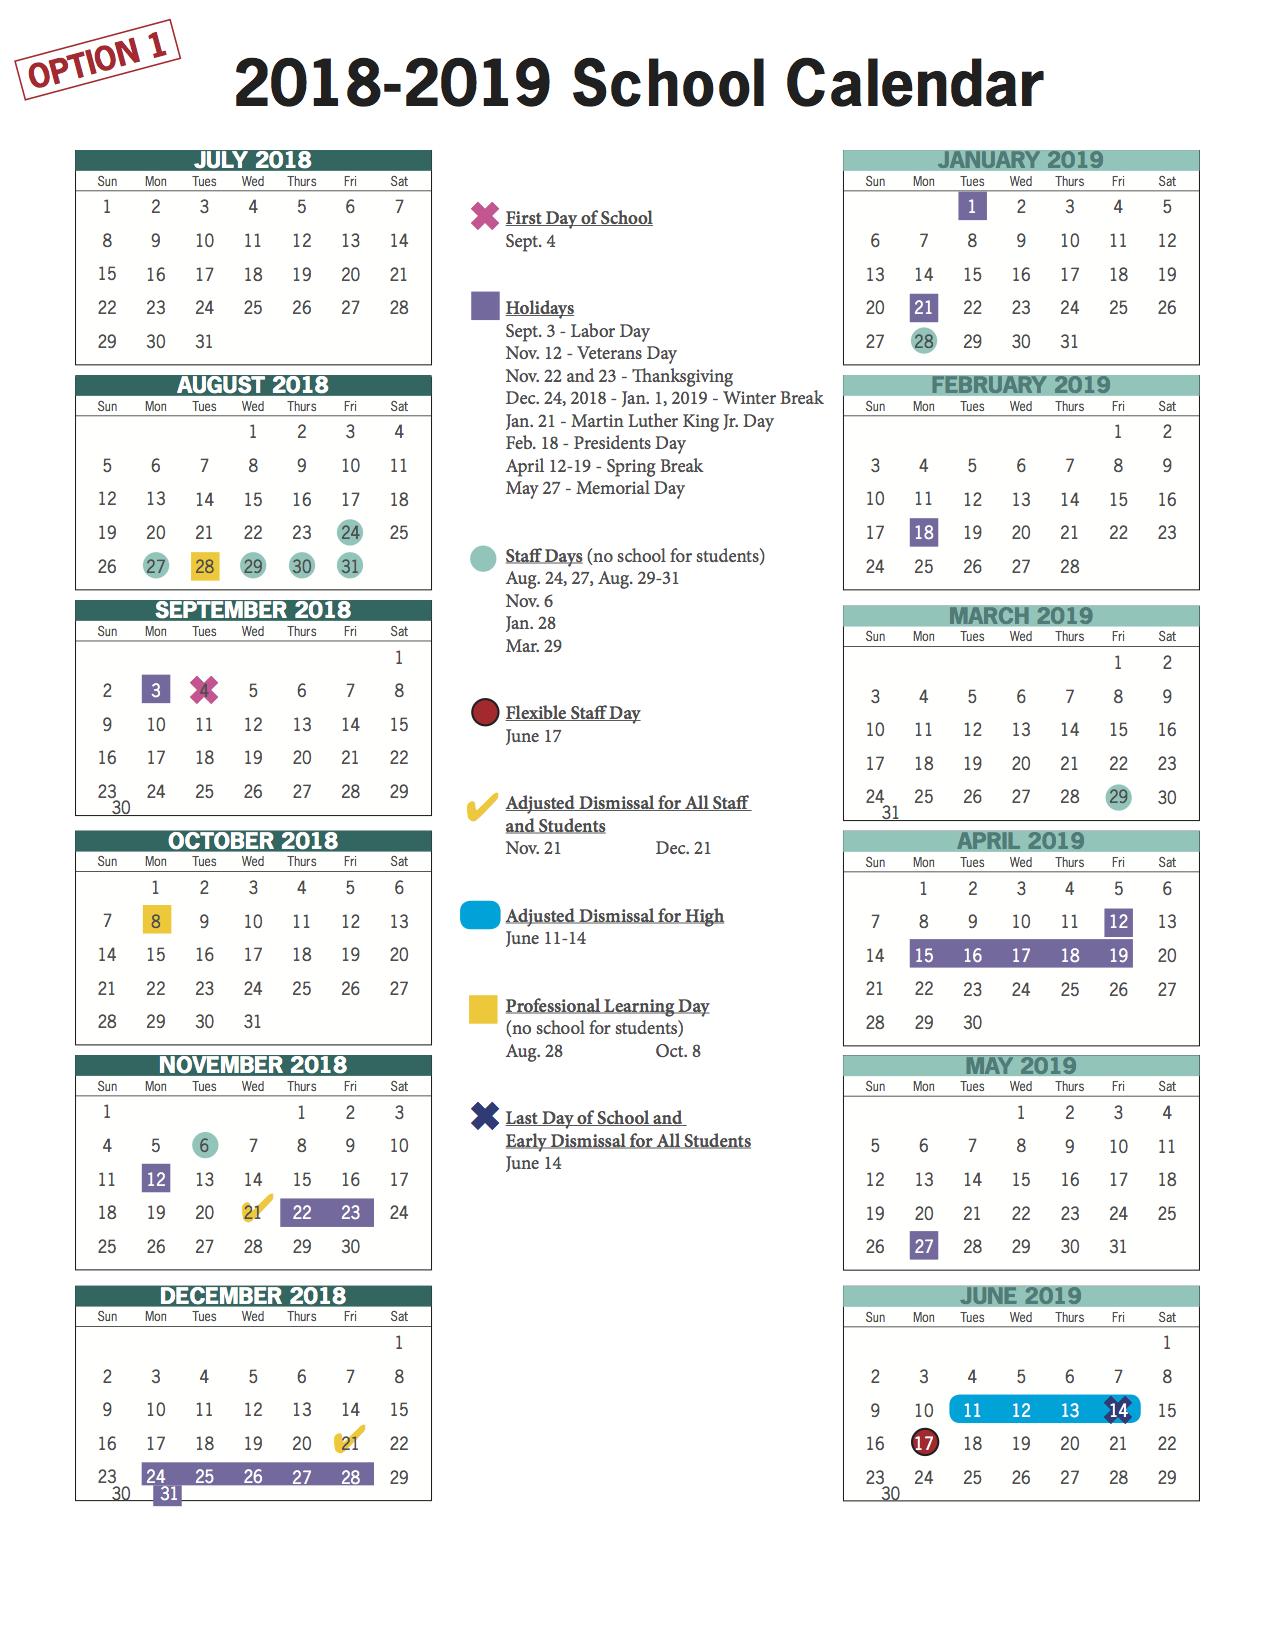 Vbcps E Town Hall - 2018 2019 And 2019 2020 School Calendar Throughout Va Beach Schools Staff Calendar